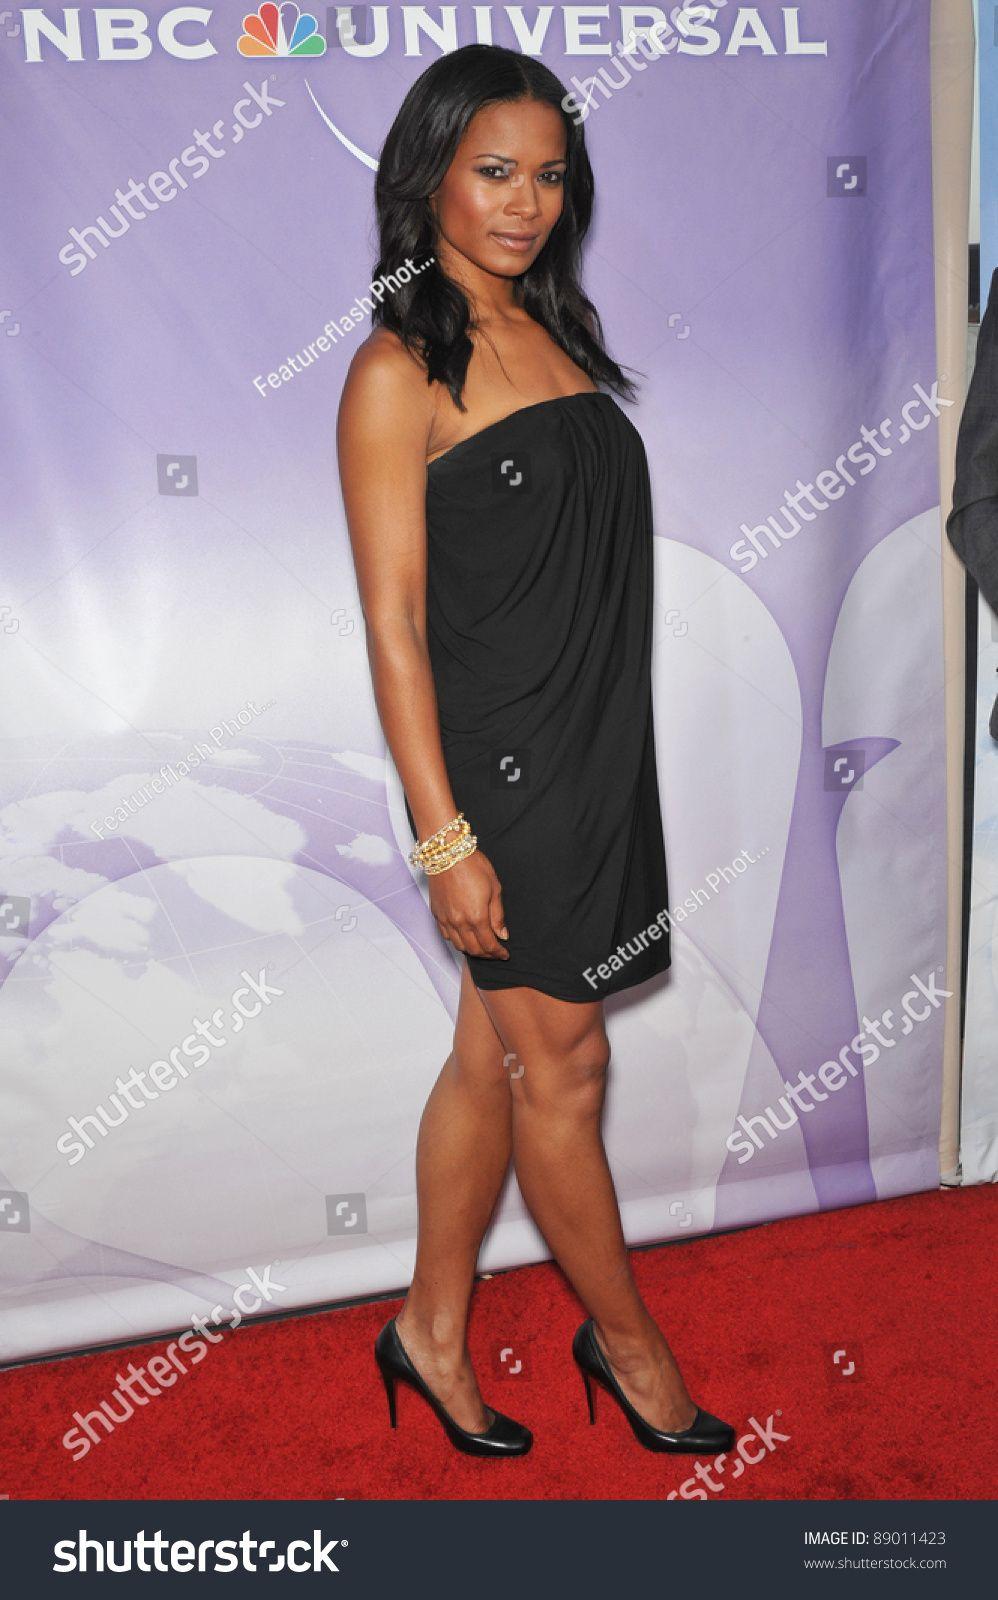 Gerit Quealy,Dian Sastrowardoyo XXX pics & movies Ana Claudia Michels 2 1999-2000,Samantha Morton (born 1977)